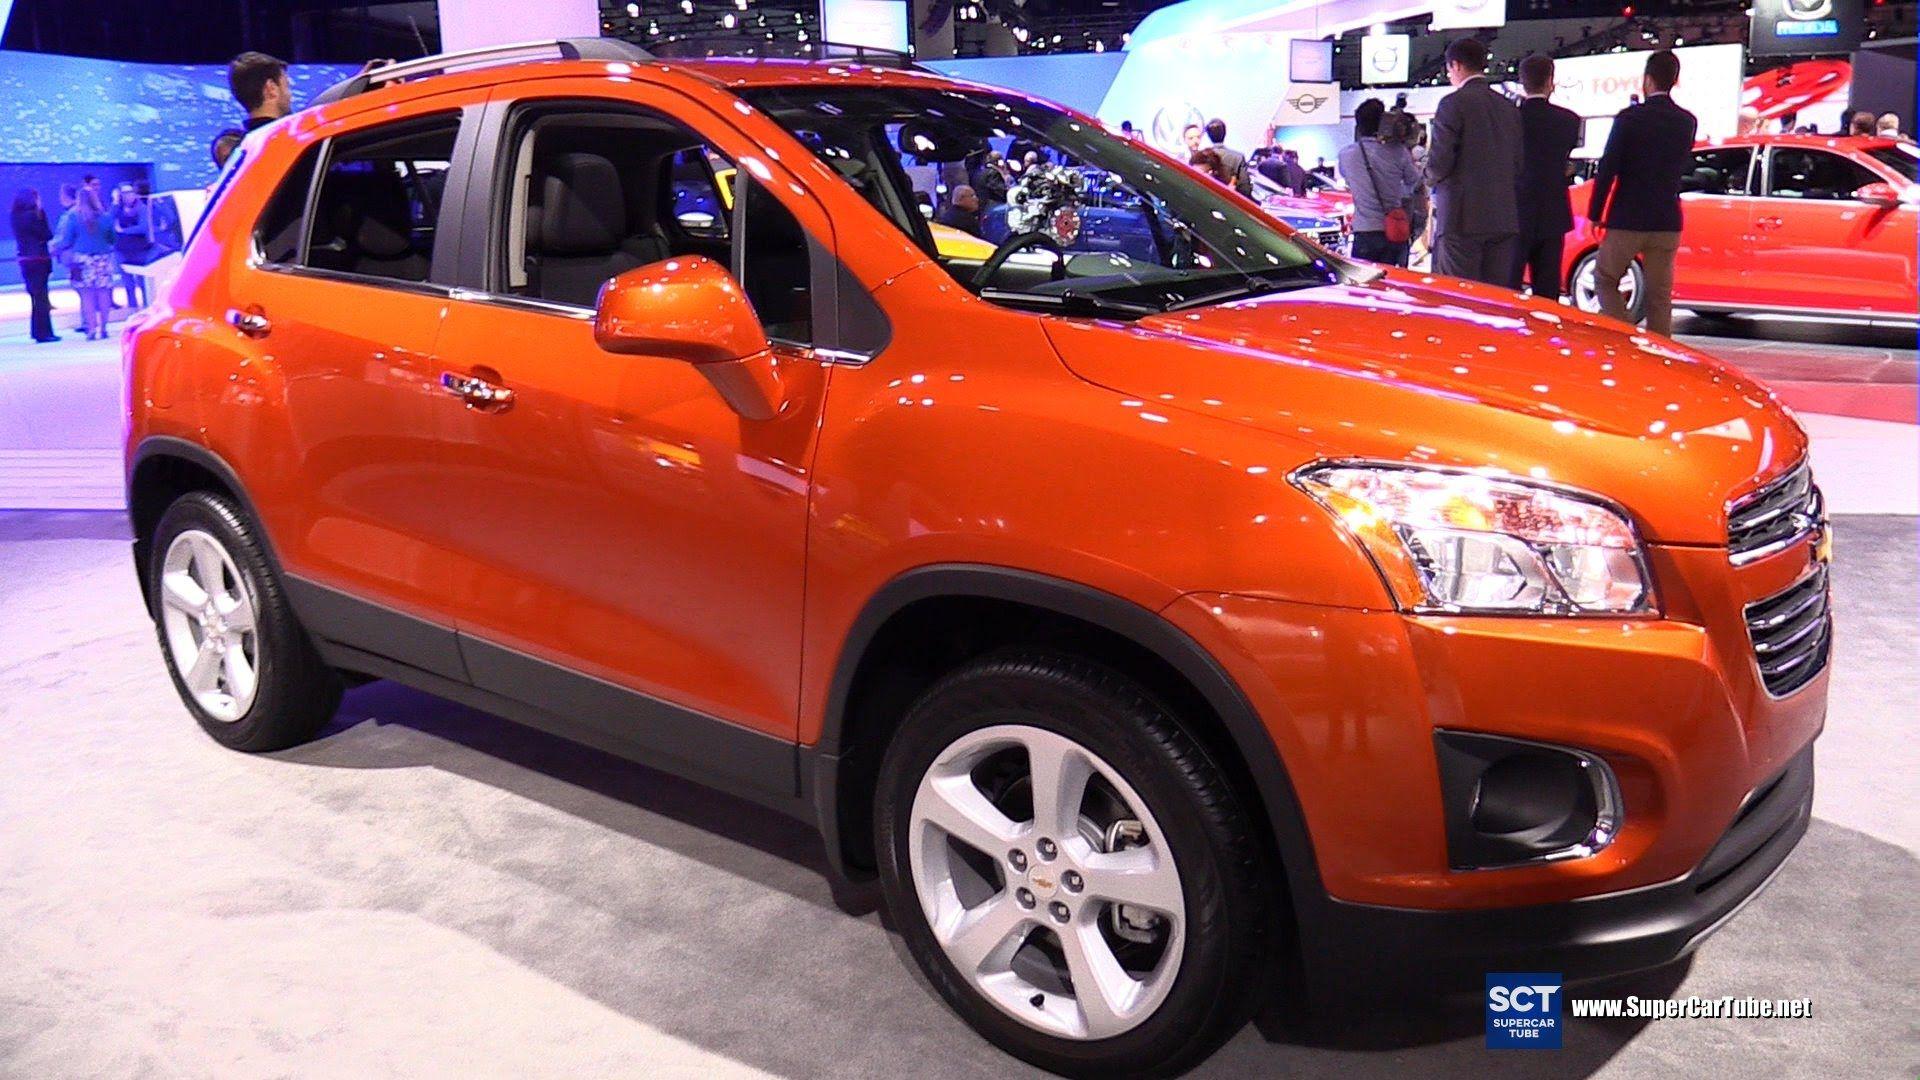 2016 Chevrolet Trax Ltz Exterior And Interior Walkaround 2015 La Aut Chevrolet Trax Best Suv Trax